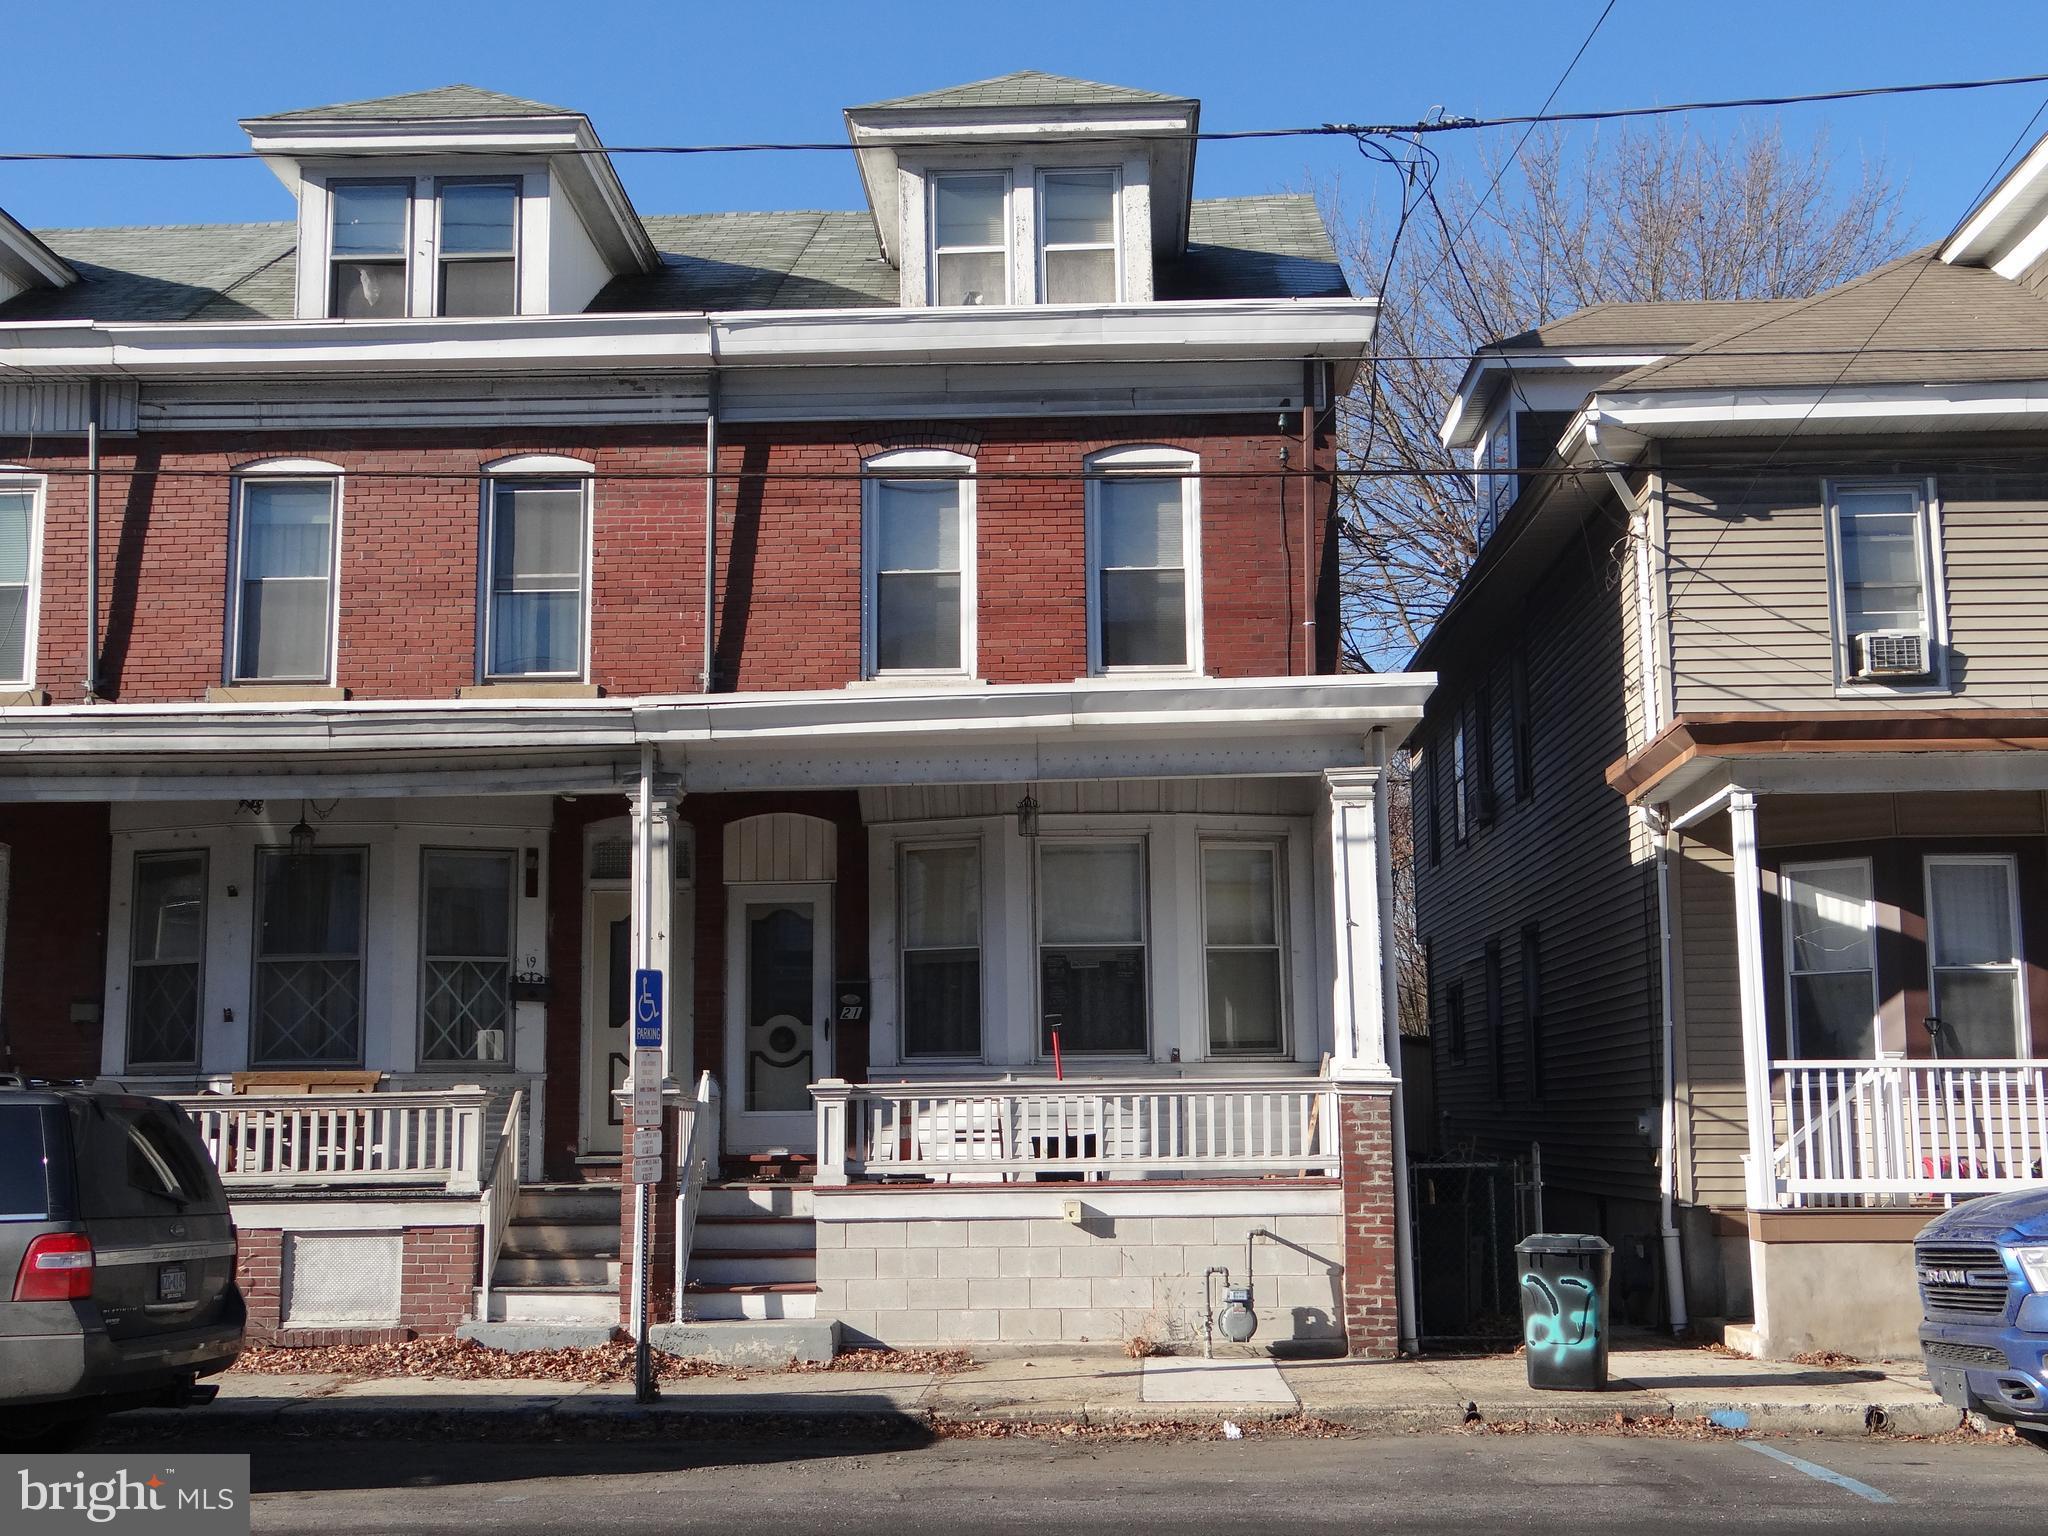 21 COAL STREET, PORT CARBON, PA 17965